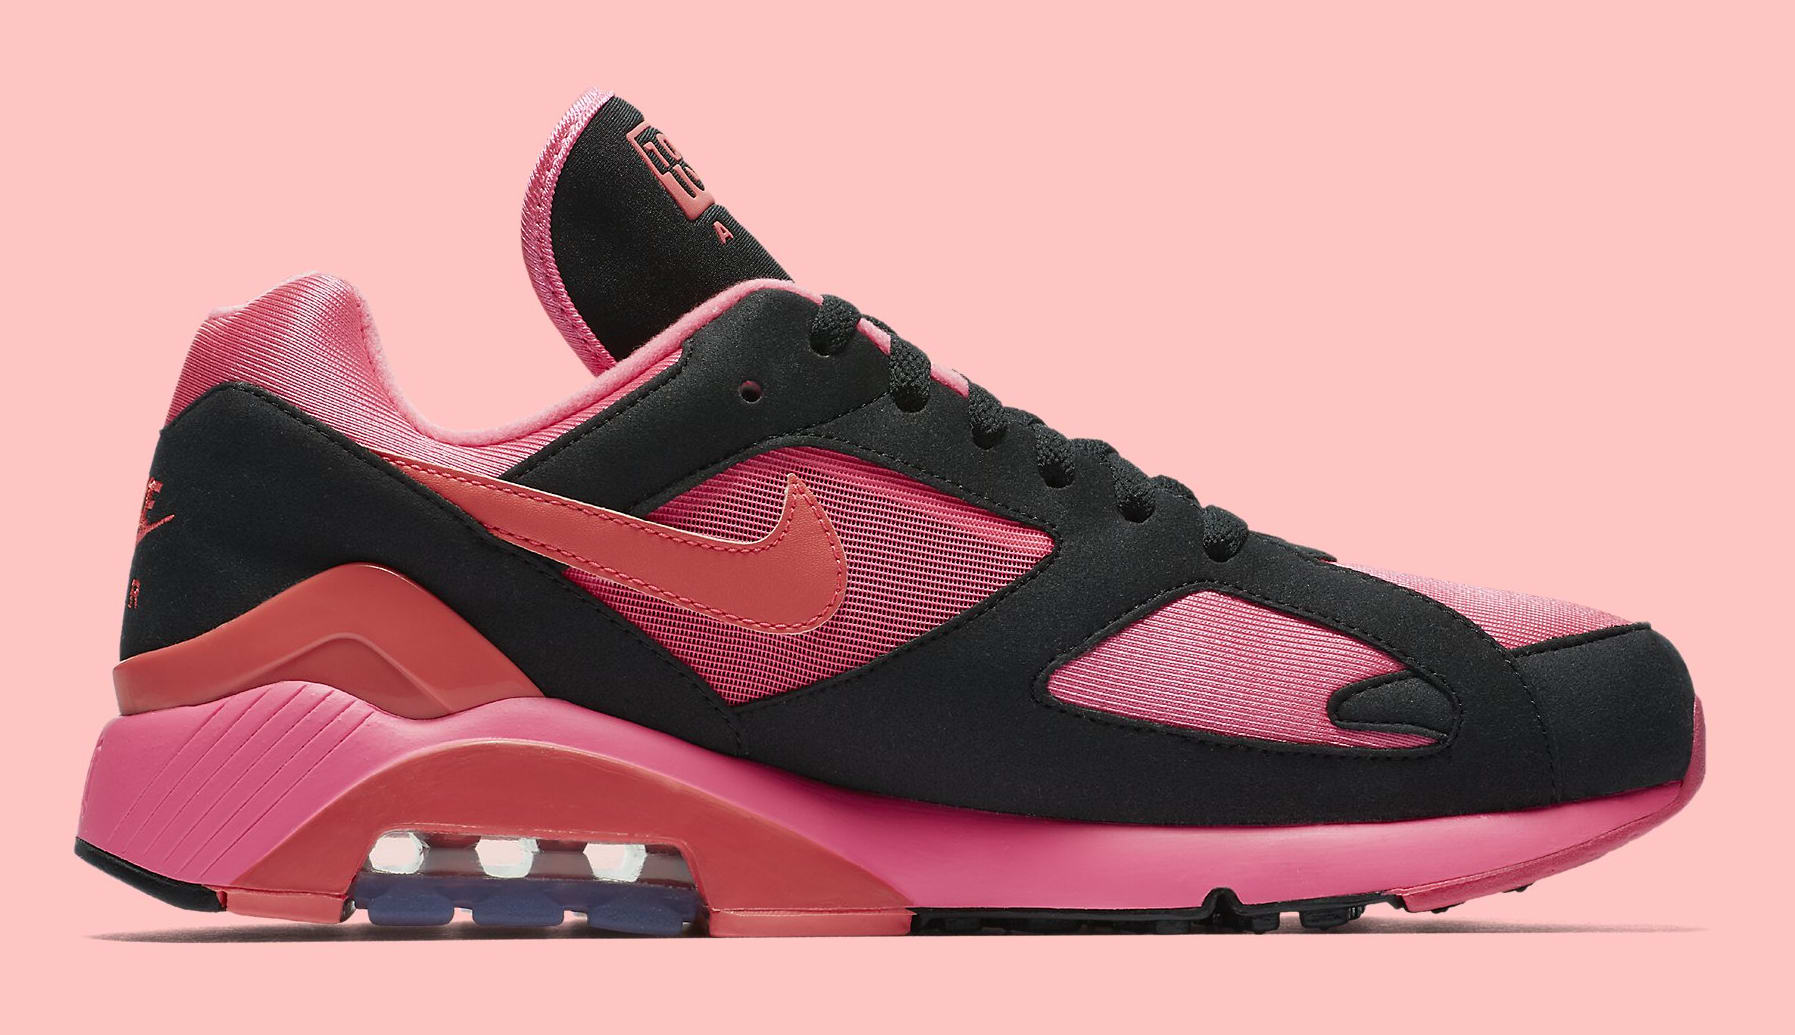 Sepatu Nike Air aMax 180 x Comme des Garcons CDG 2018 - Black Pink